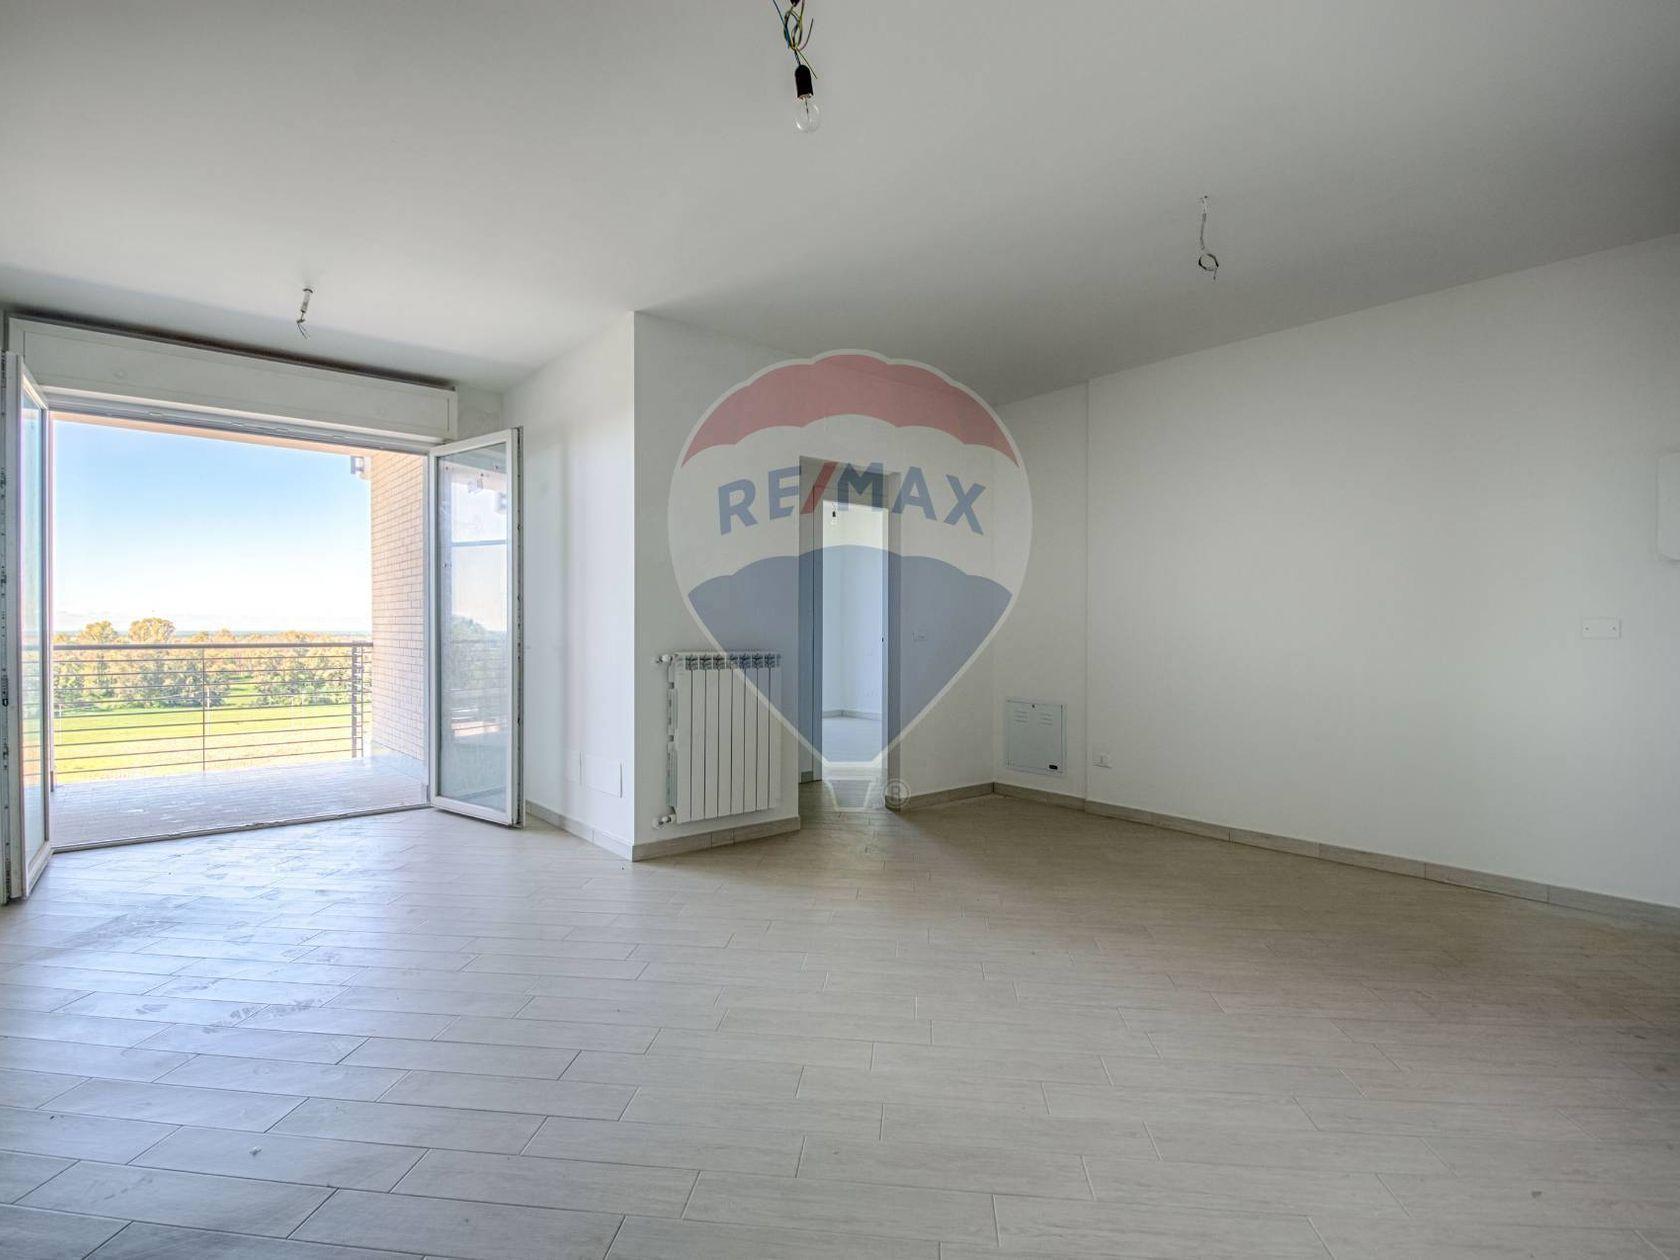 Appartamento Ara Nova, Fiumicino, RM Vendita - Foto 6